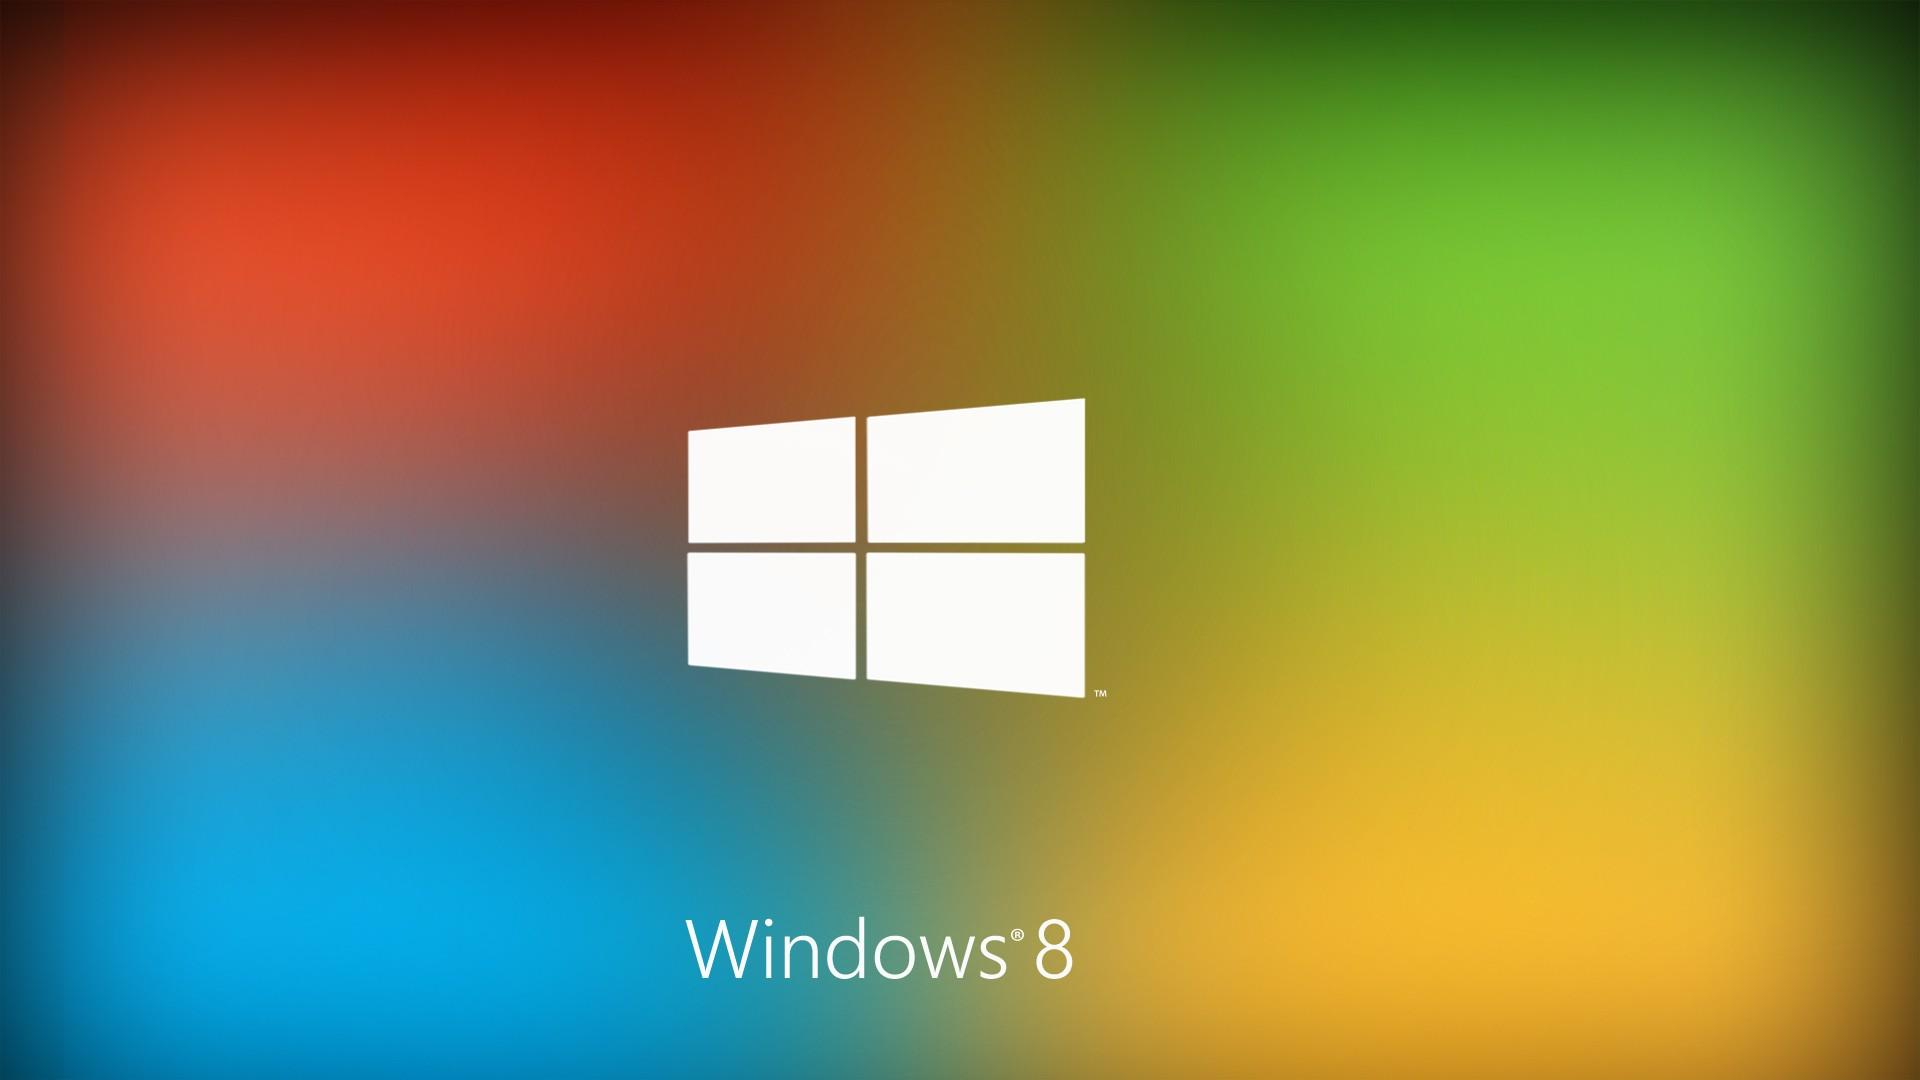 5 برتری امنیتی ویندوز 8 بر ویندوز 7